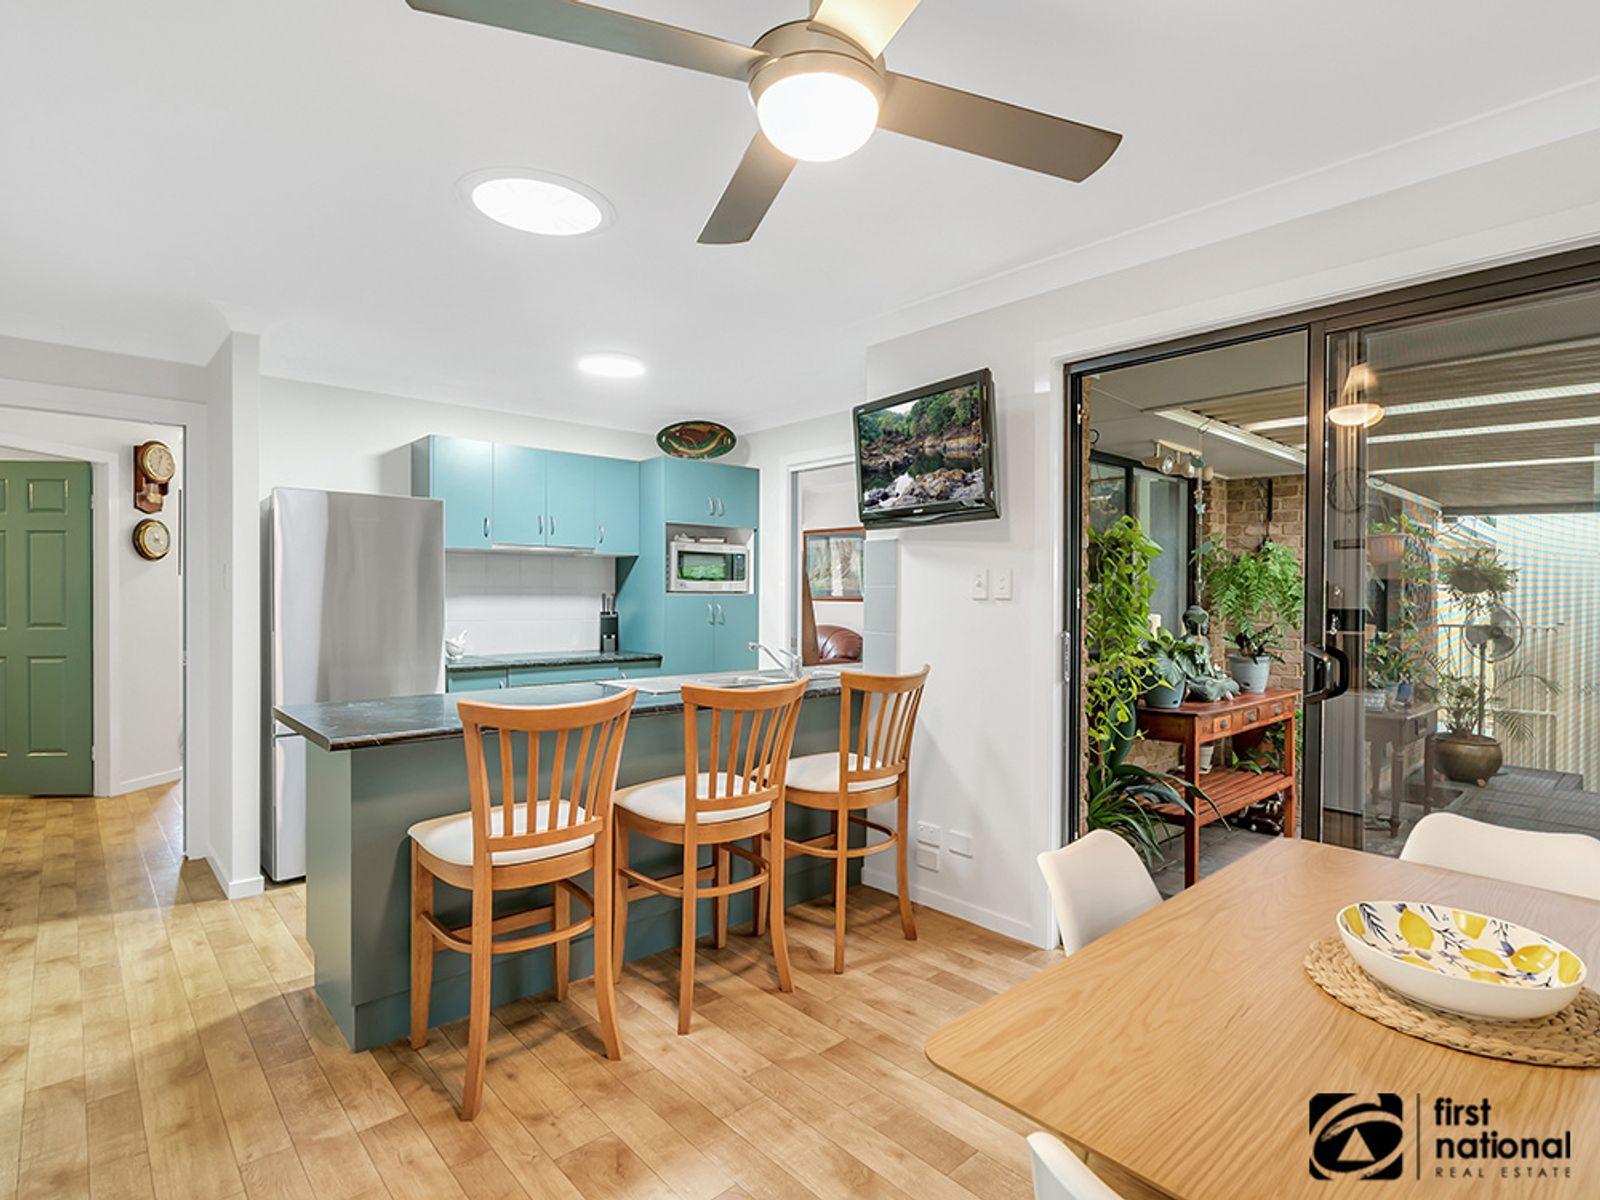 46 Lamberts Road, Boambee East, NSW 2452